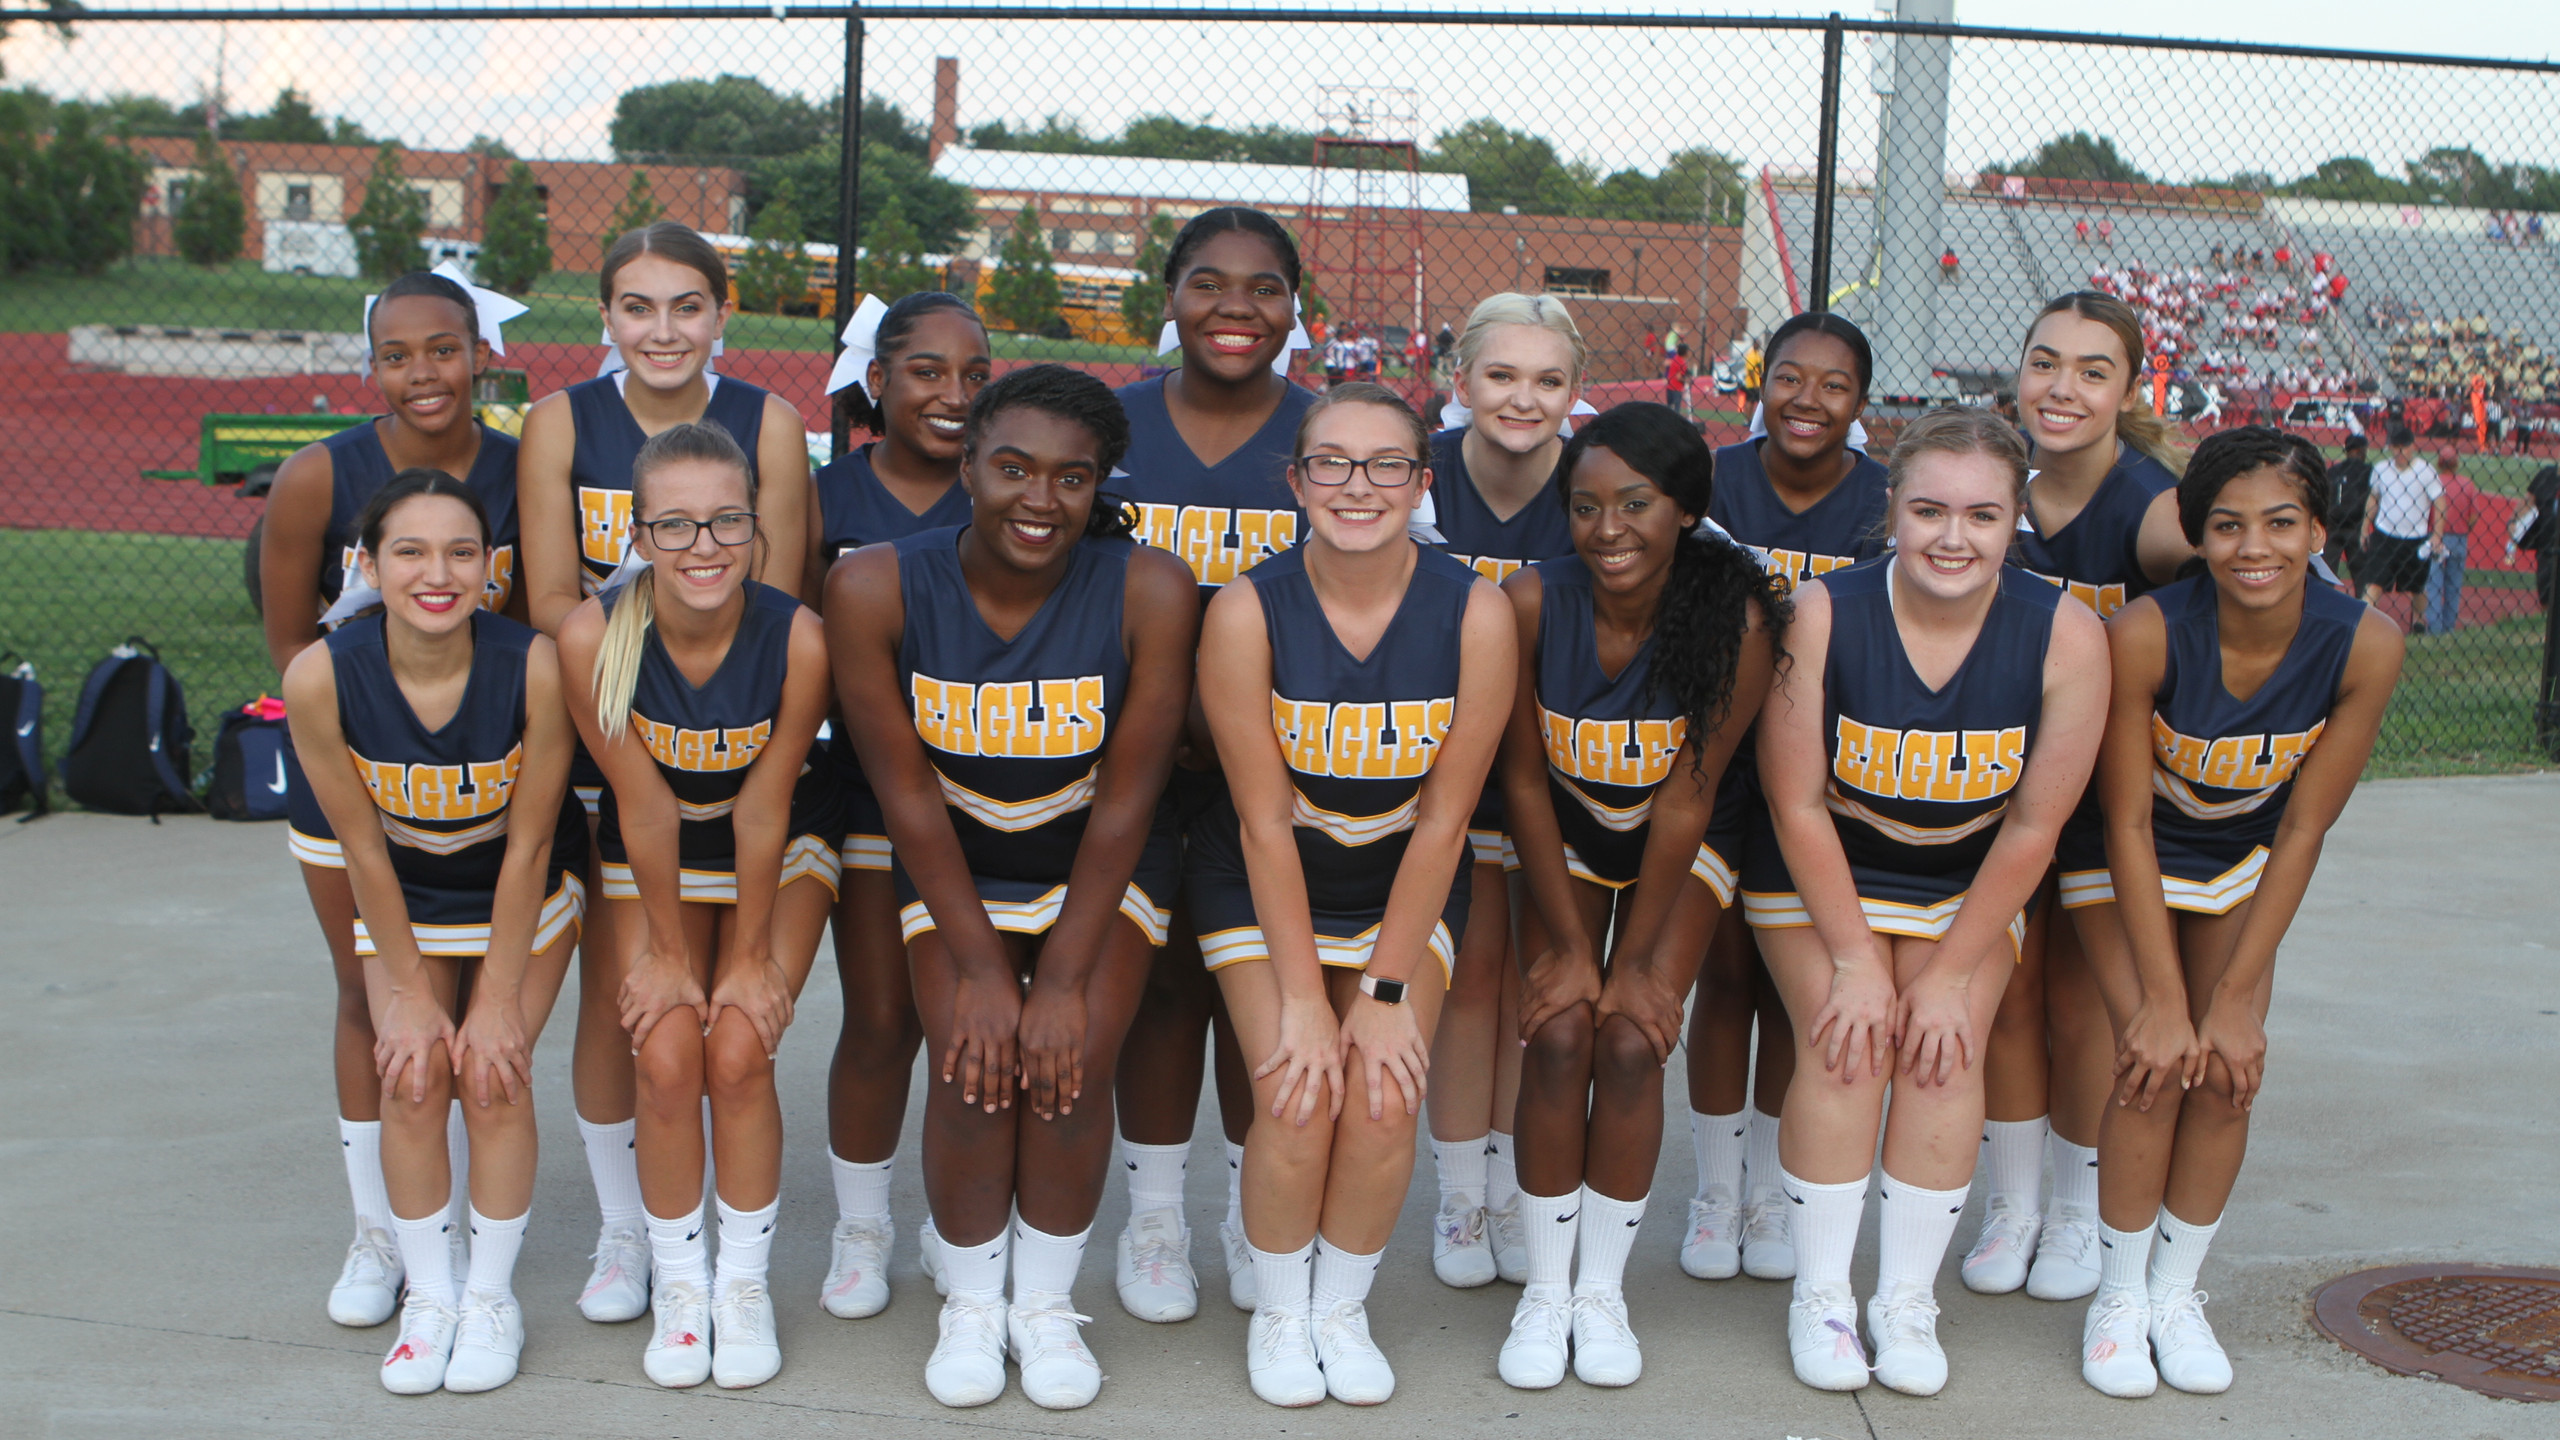 Northeast Eagles Cheerleaders 2